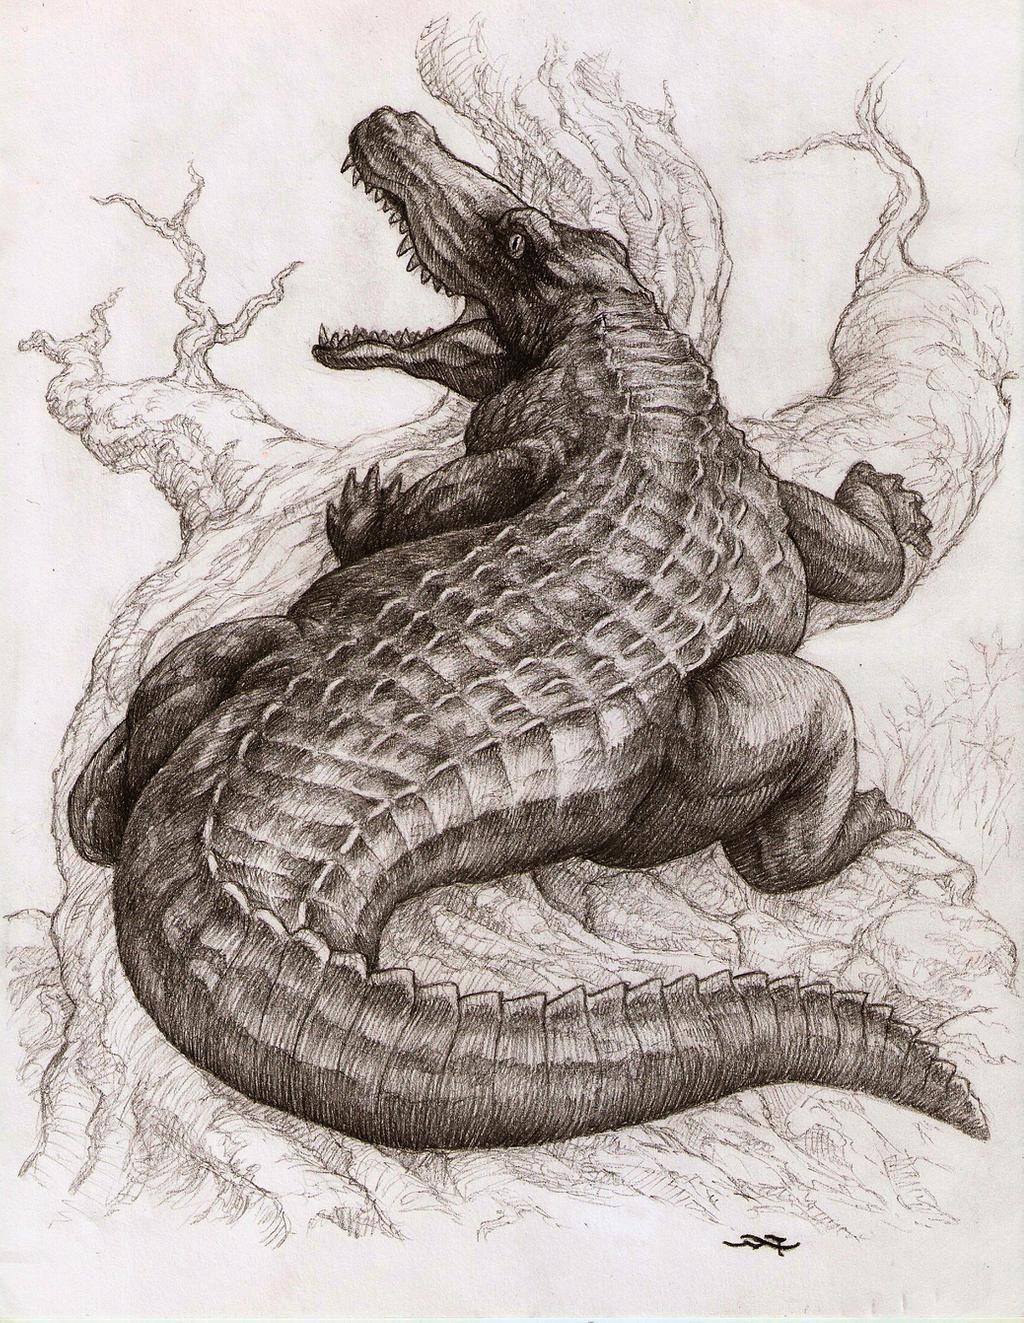 Realistic Alligator Drawing : realistic, alligator, drawing, CROCODILE, Adanart, DeviantArt, Alligators, Crocodile, Illustration,, Pencil, Drawings, Animals